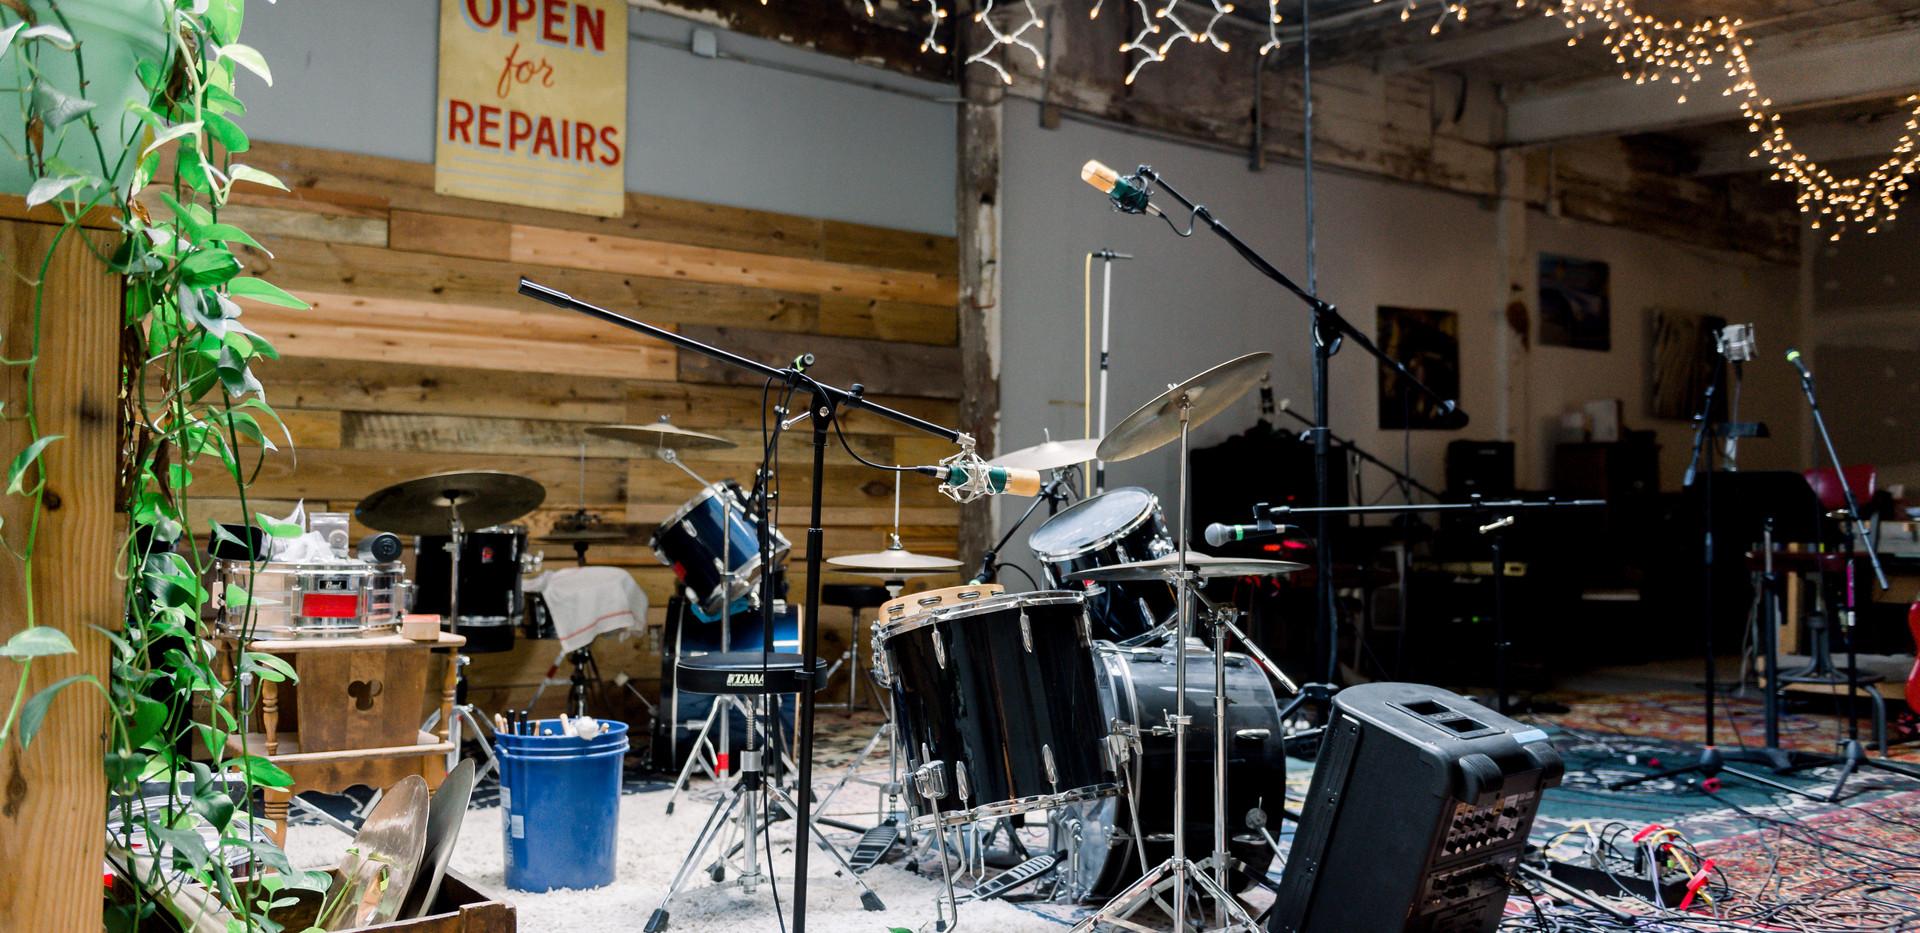 norwood-commerce-center-studio-space-5.jpg